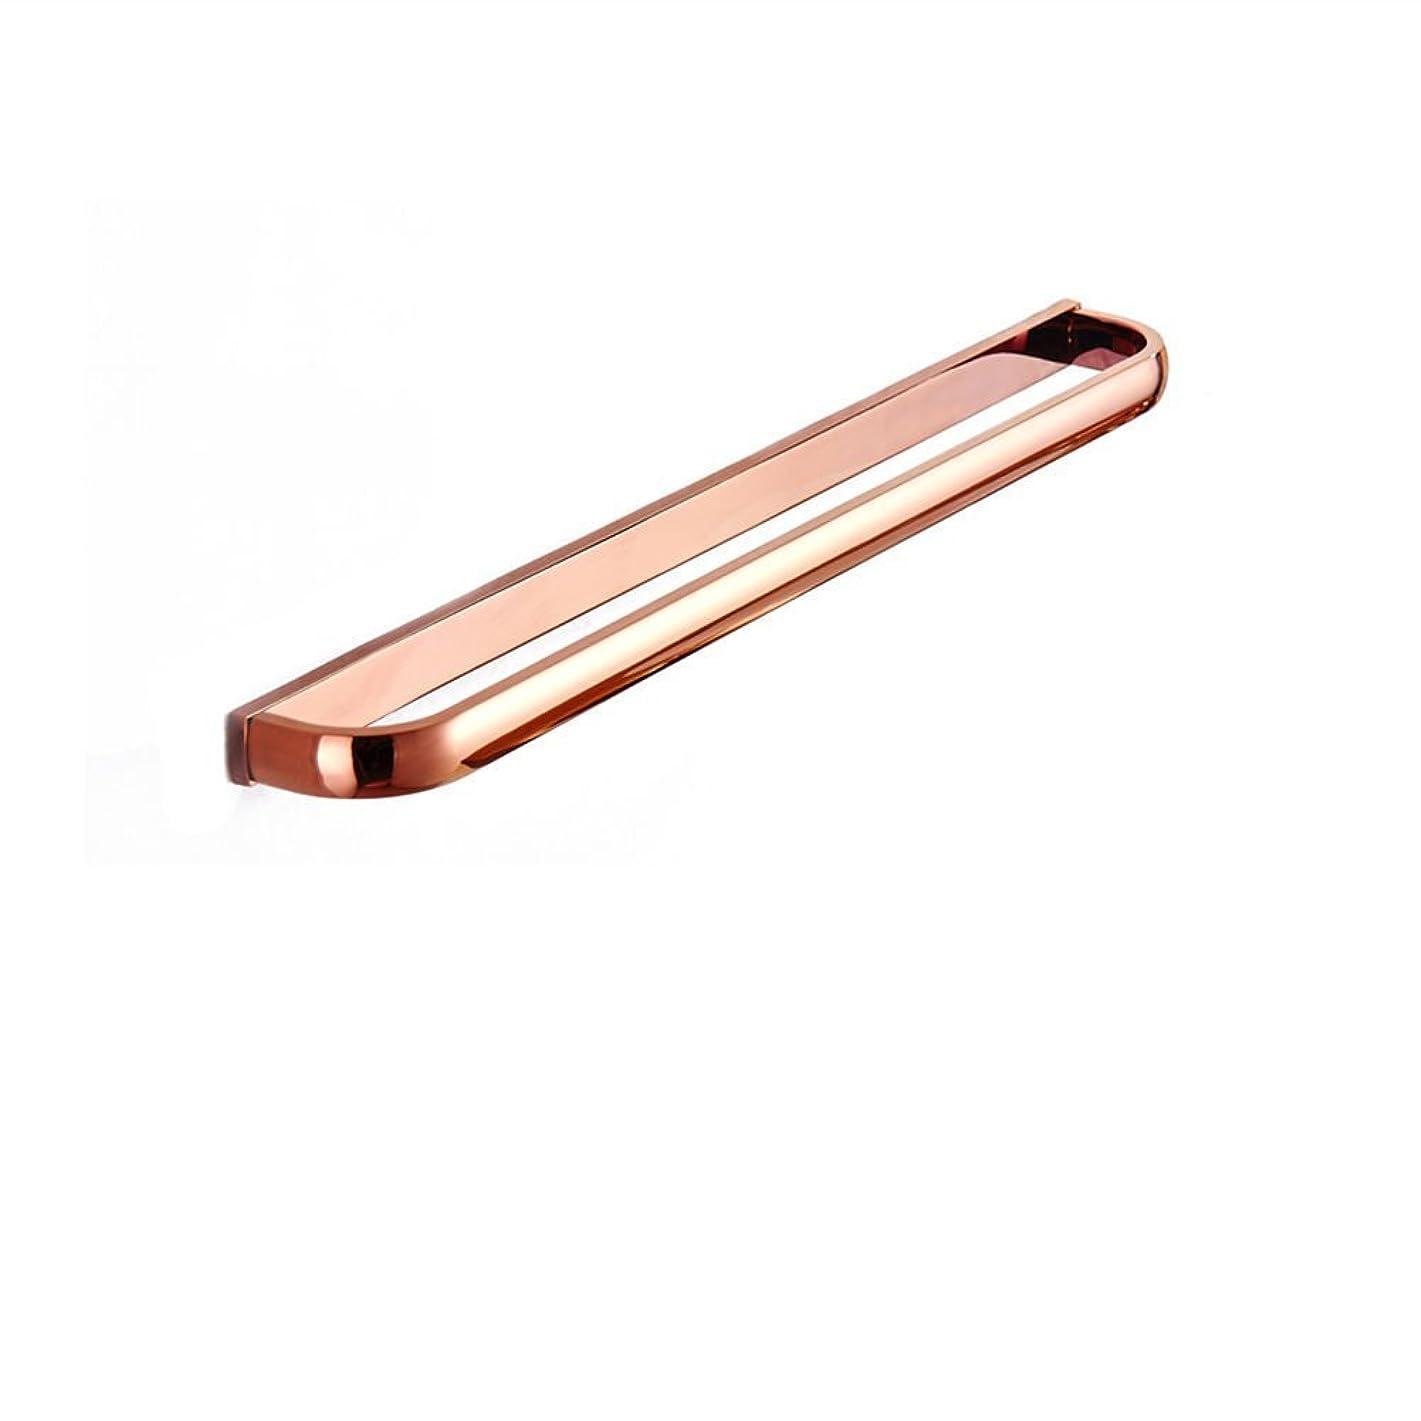 Aothpher 24 inch/60cm Wall Mounted Copper Bathroom Towel Bar Single Towel Rack, Rose Gold Polished